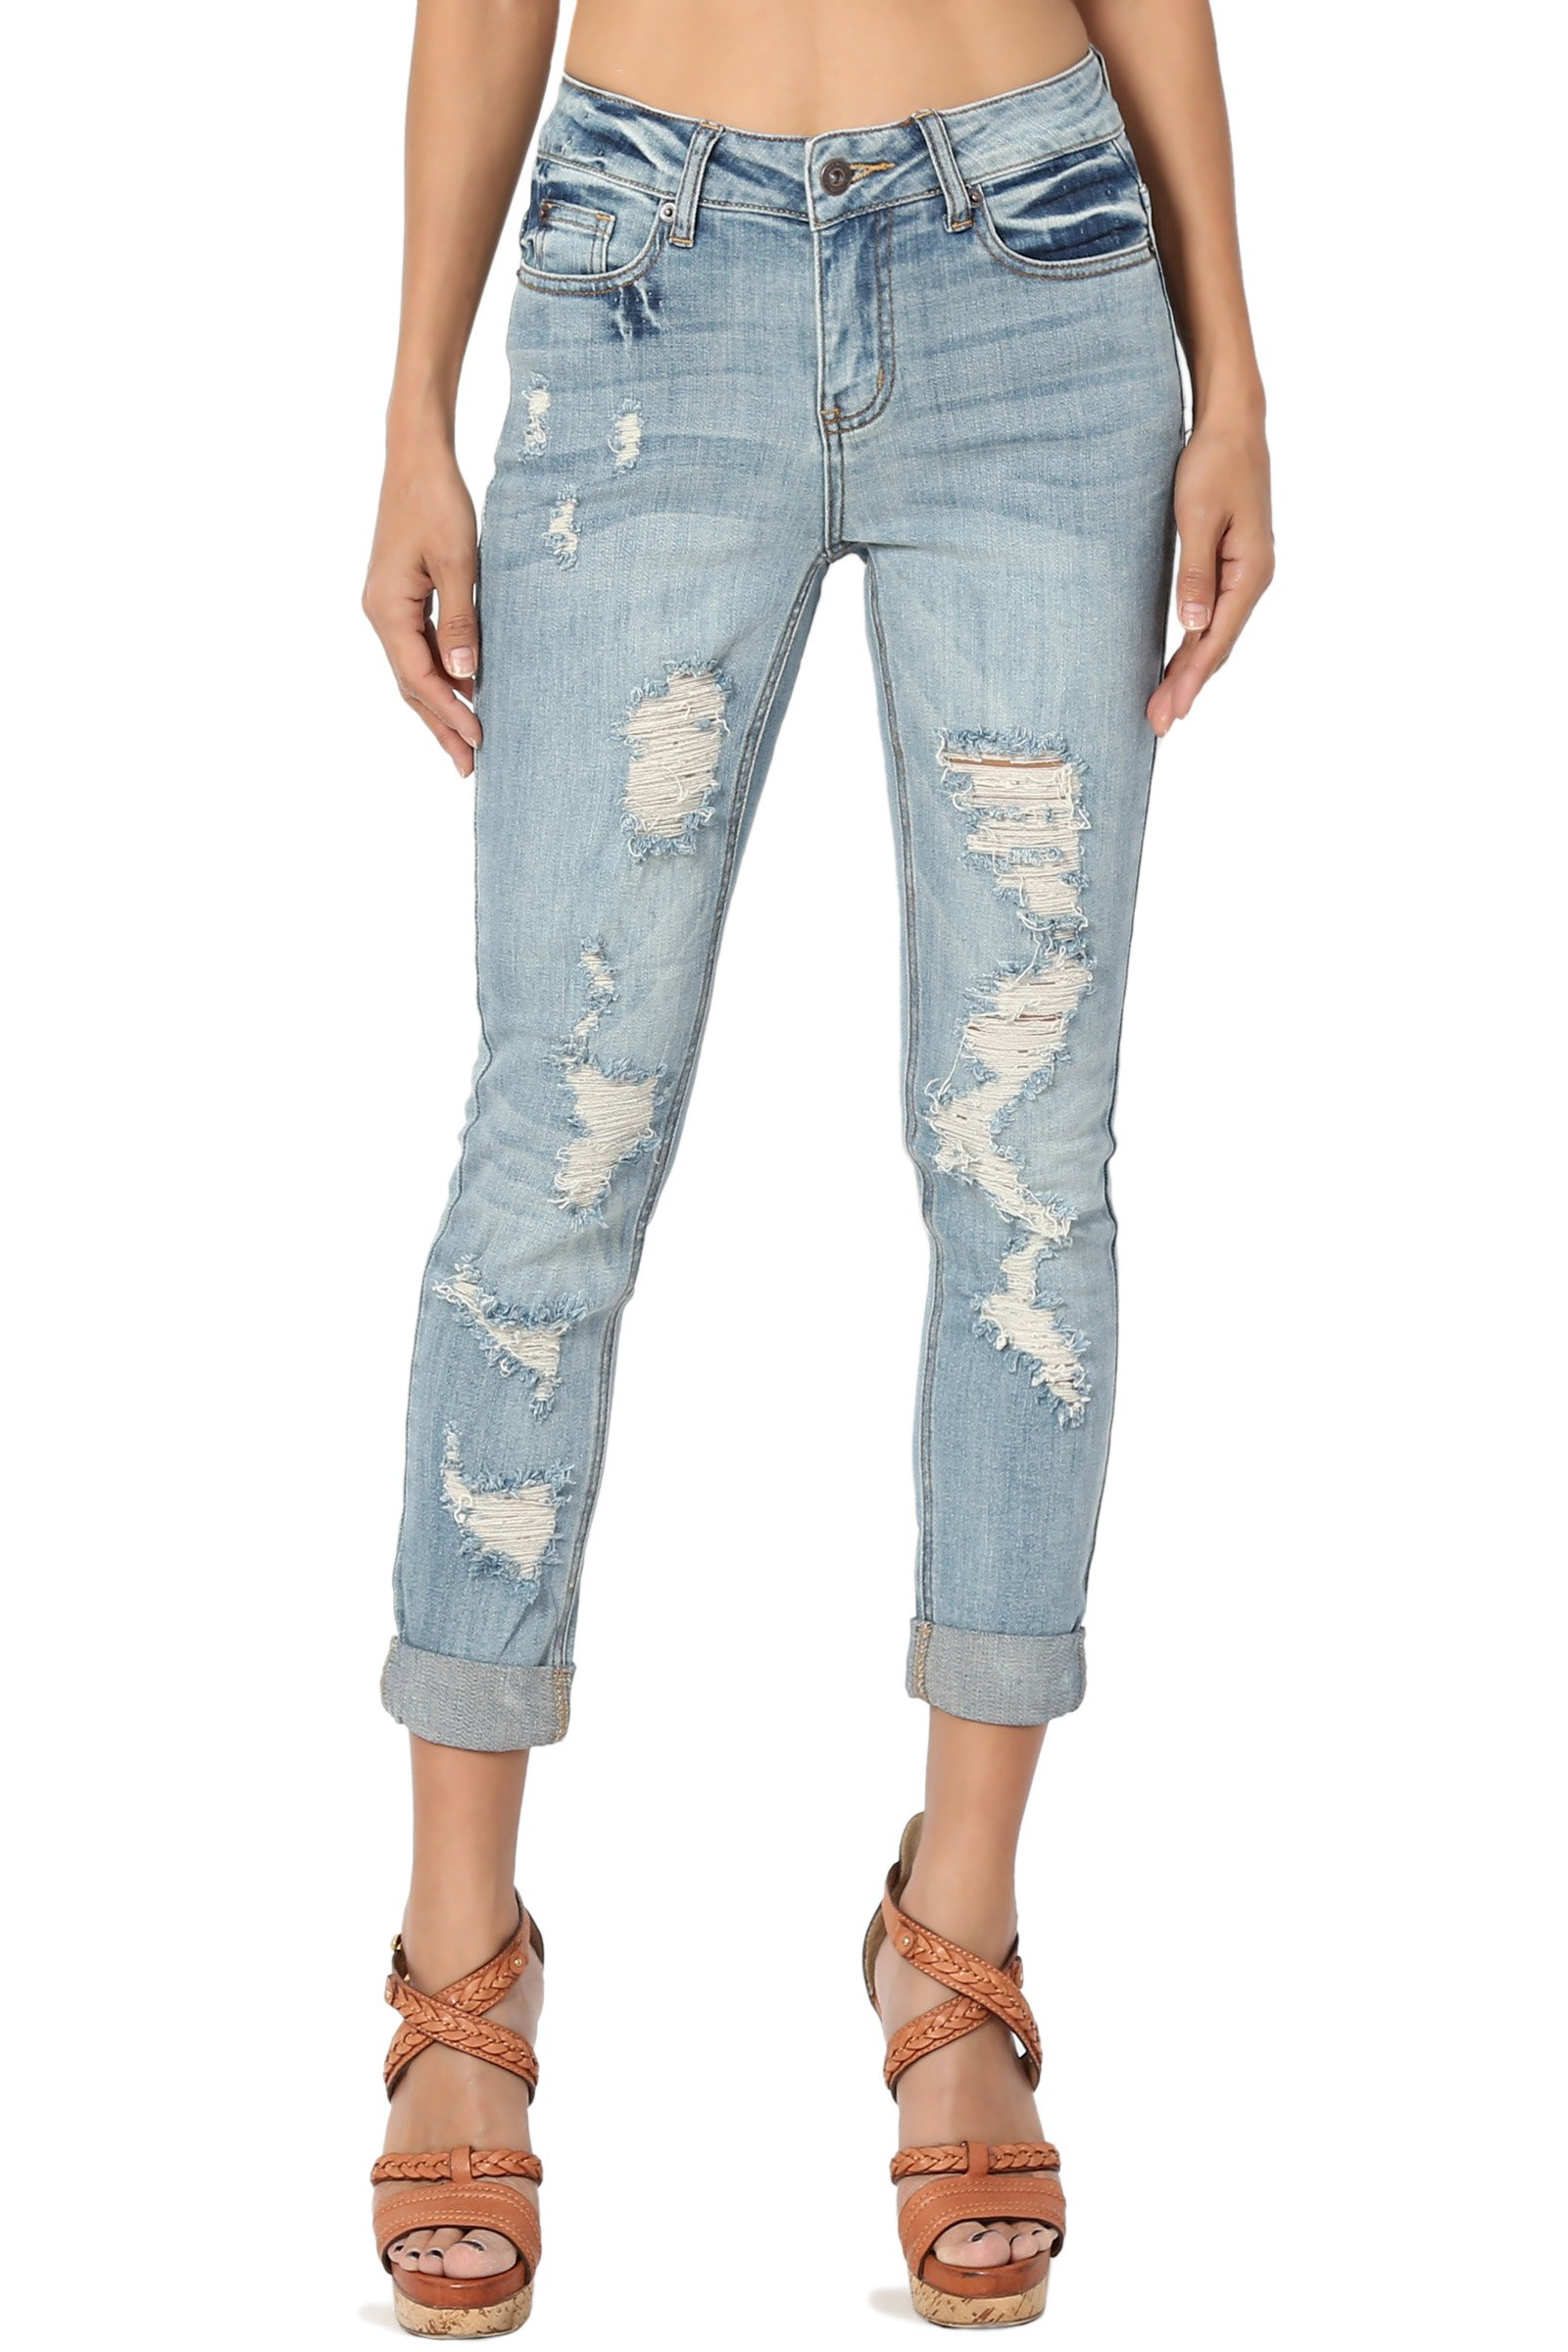 TheMogan Junior's Distressed Stretch Mid Rise Crop Slim Boyfriend Jeans Light 5